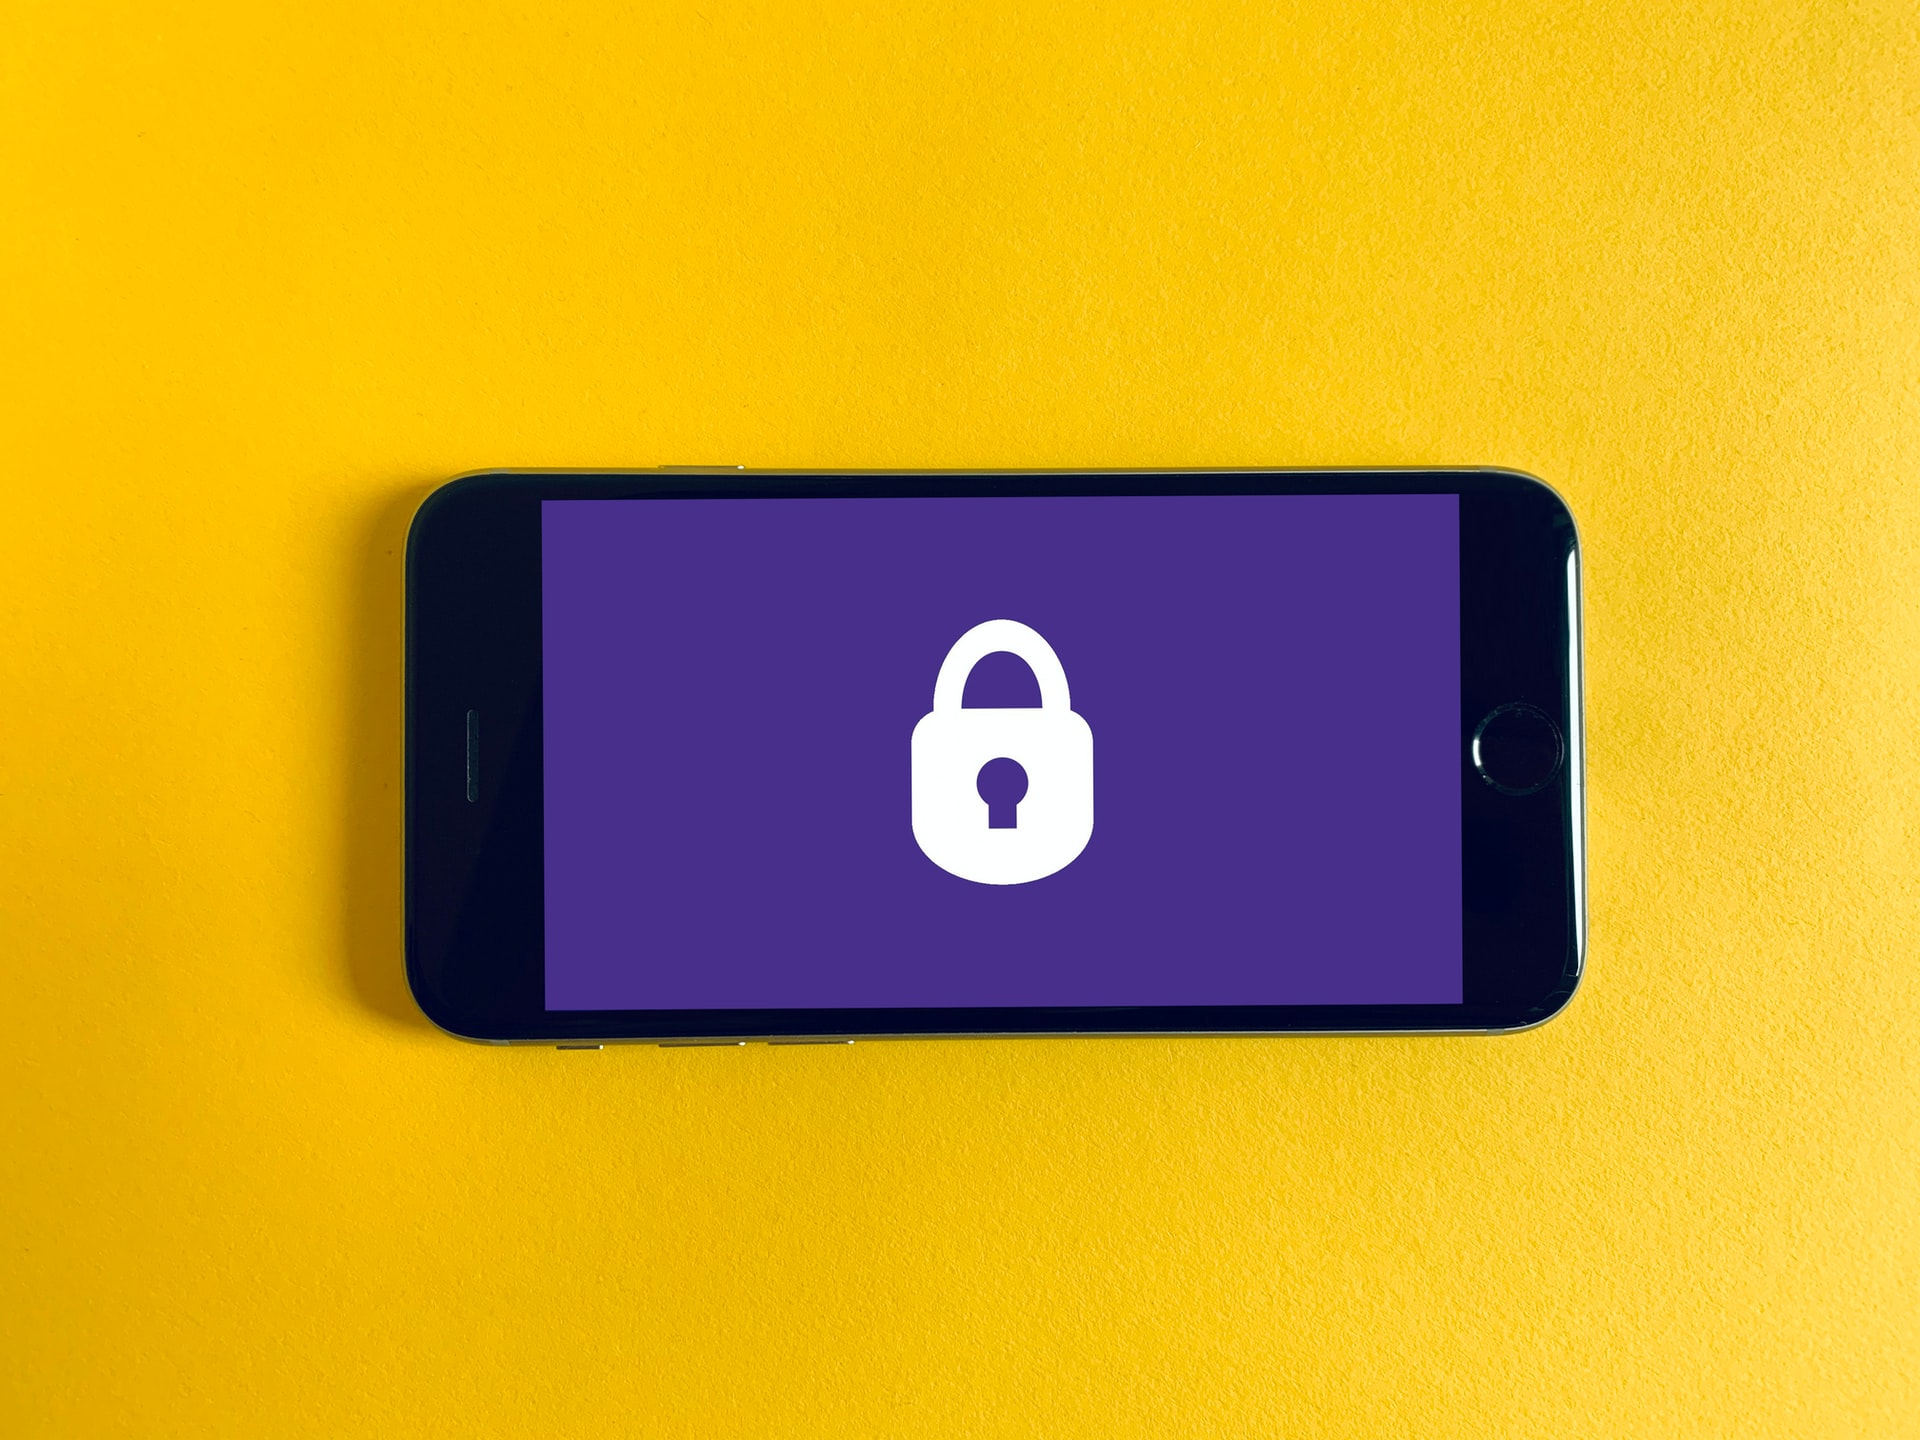 Lindungi Data Pribadimu, Ini 10 Tips Aman Berinternet dari Google